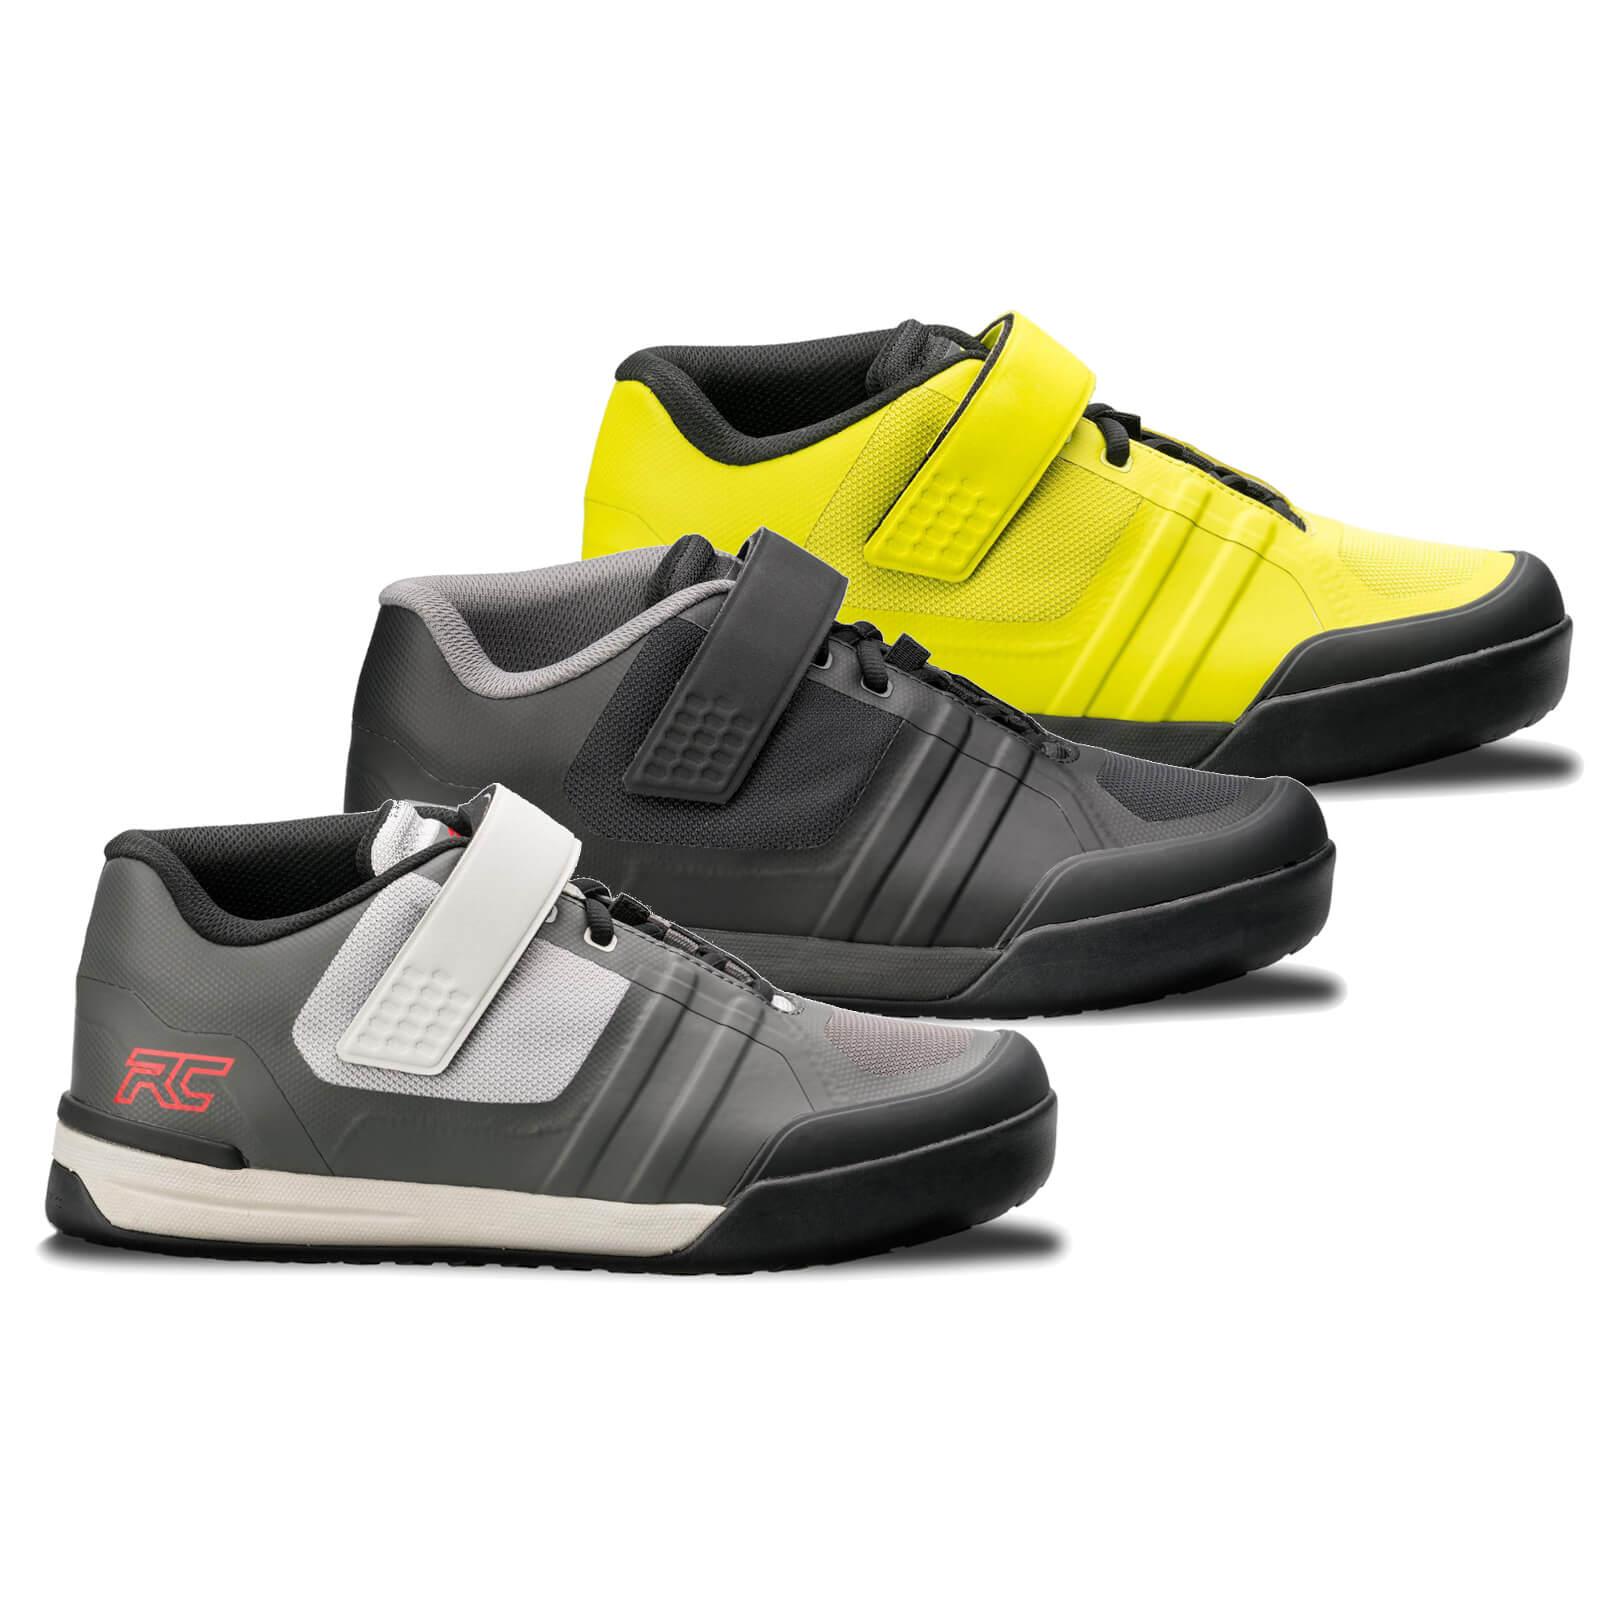 Ride Concepts Transition SPD MTB Shoes - UK 10/EU 44 - Black/Charcoal